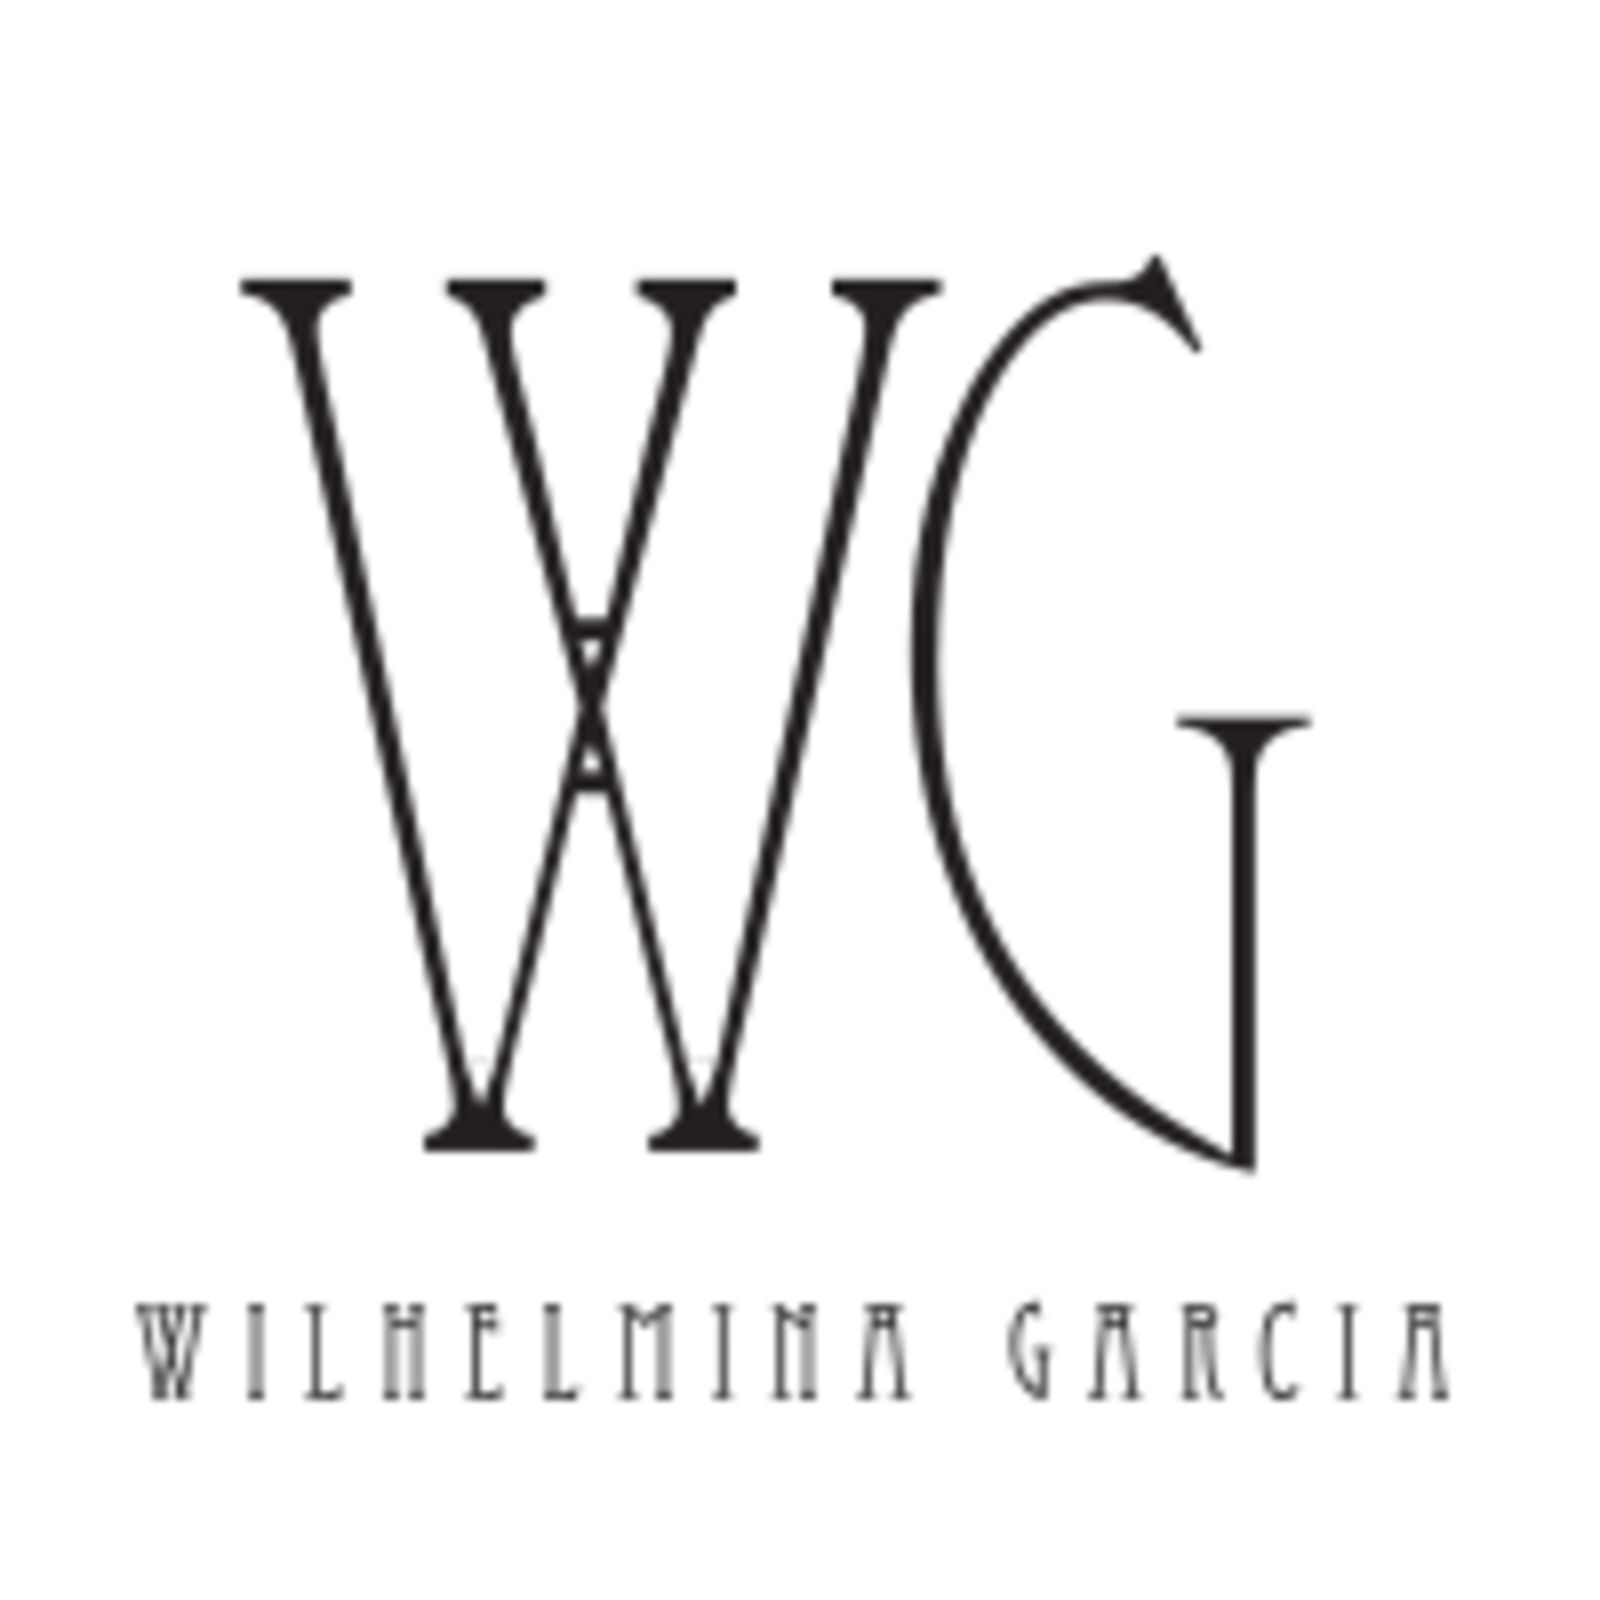 WILHELMINA GARCIA